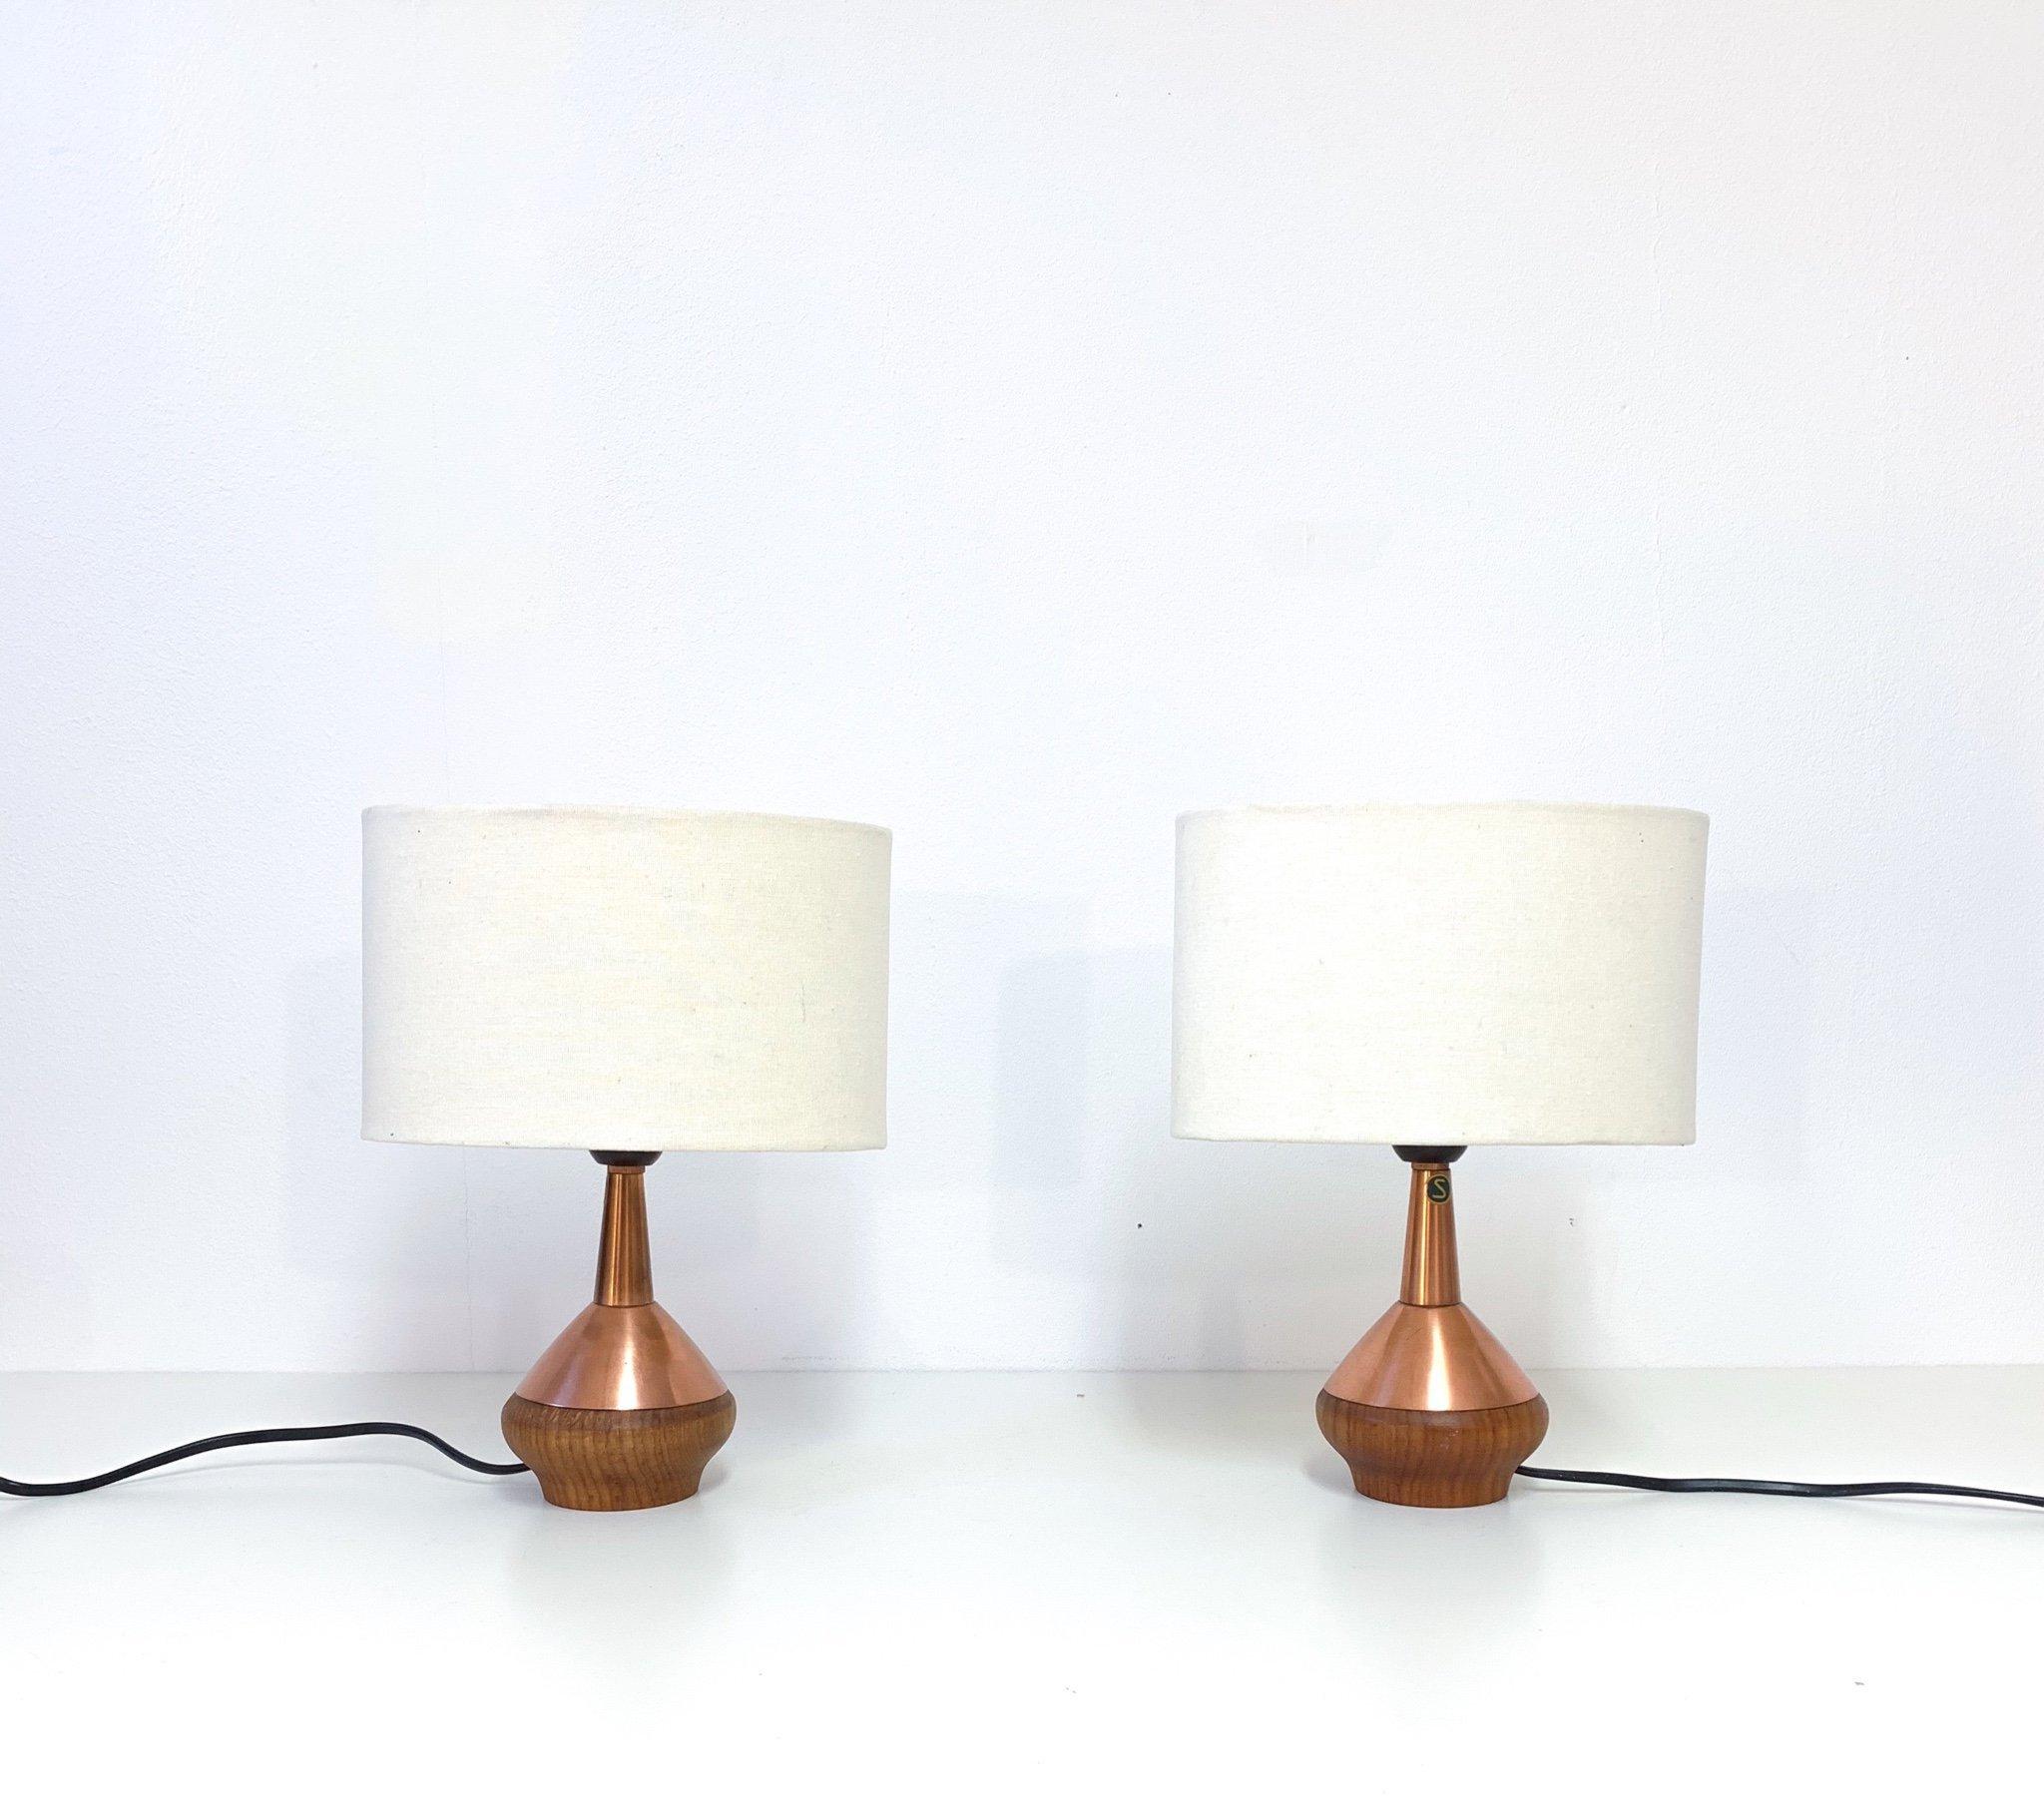 ASEA Belysning 2 st, bordslampor lampor teak & koppar ( retro lampa )